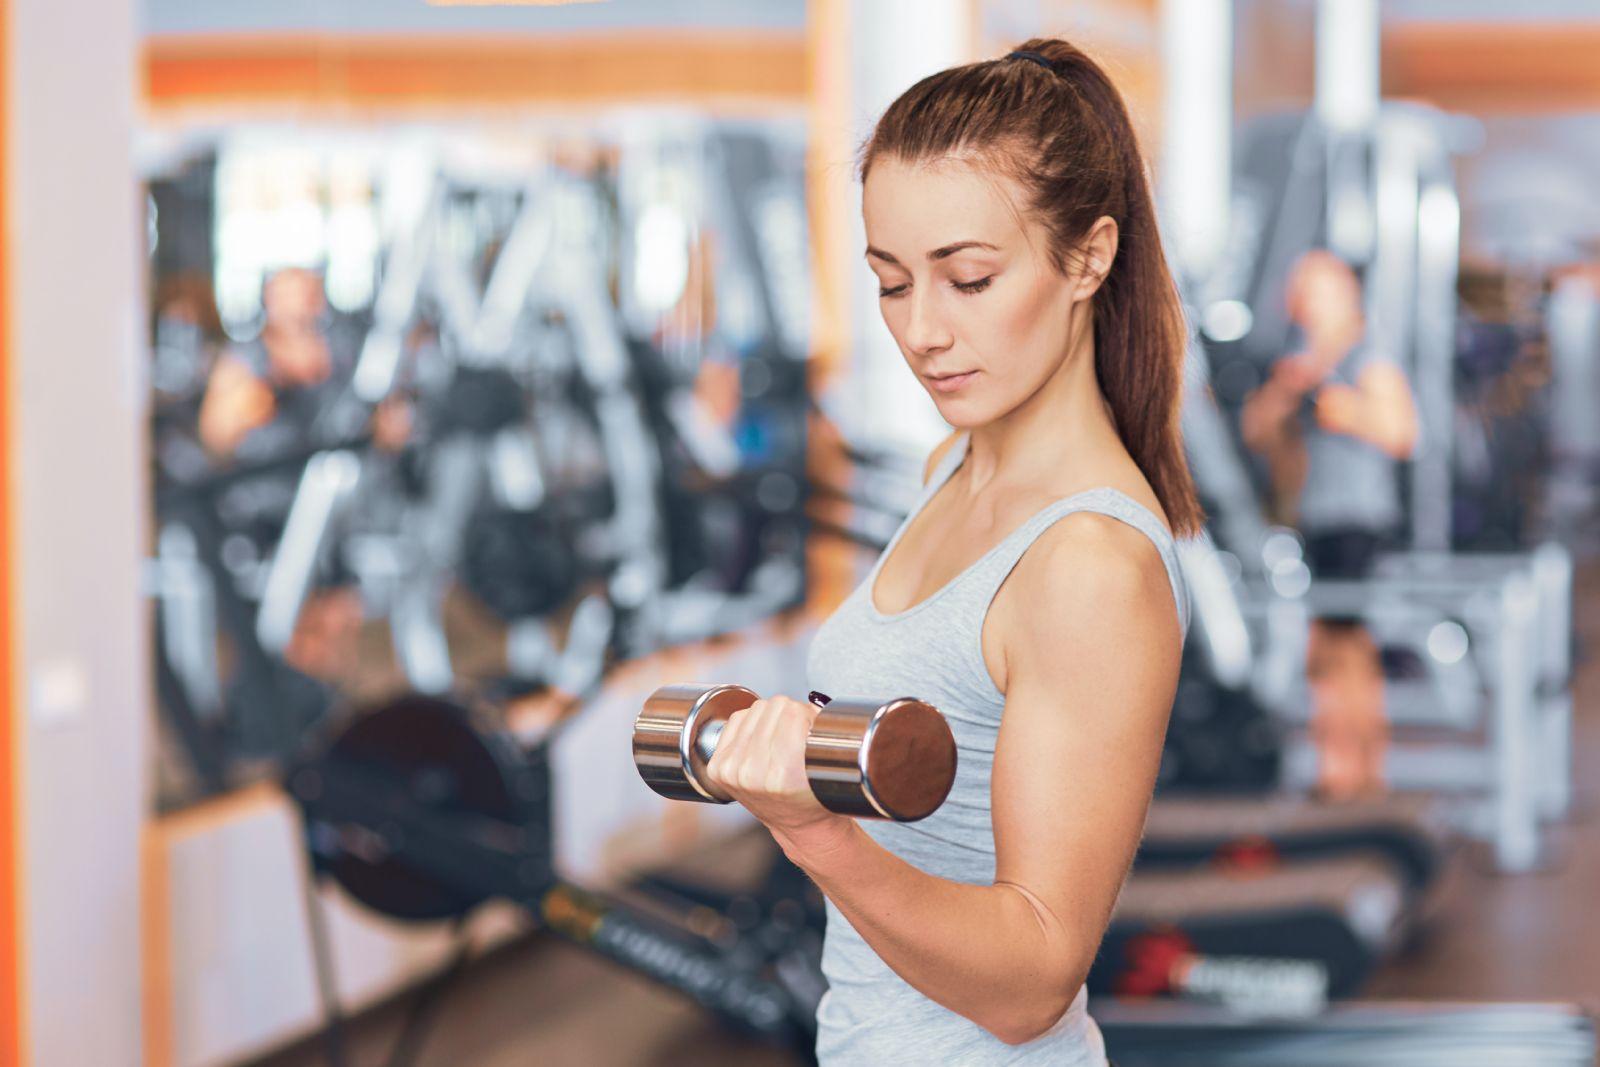 11 Unilateral Training Exercises for Beginners